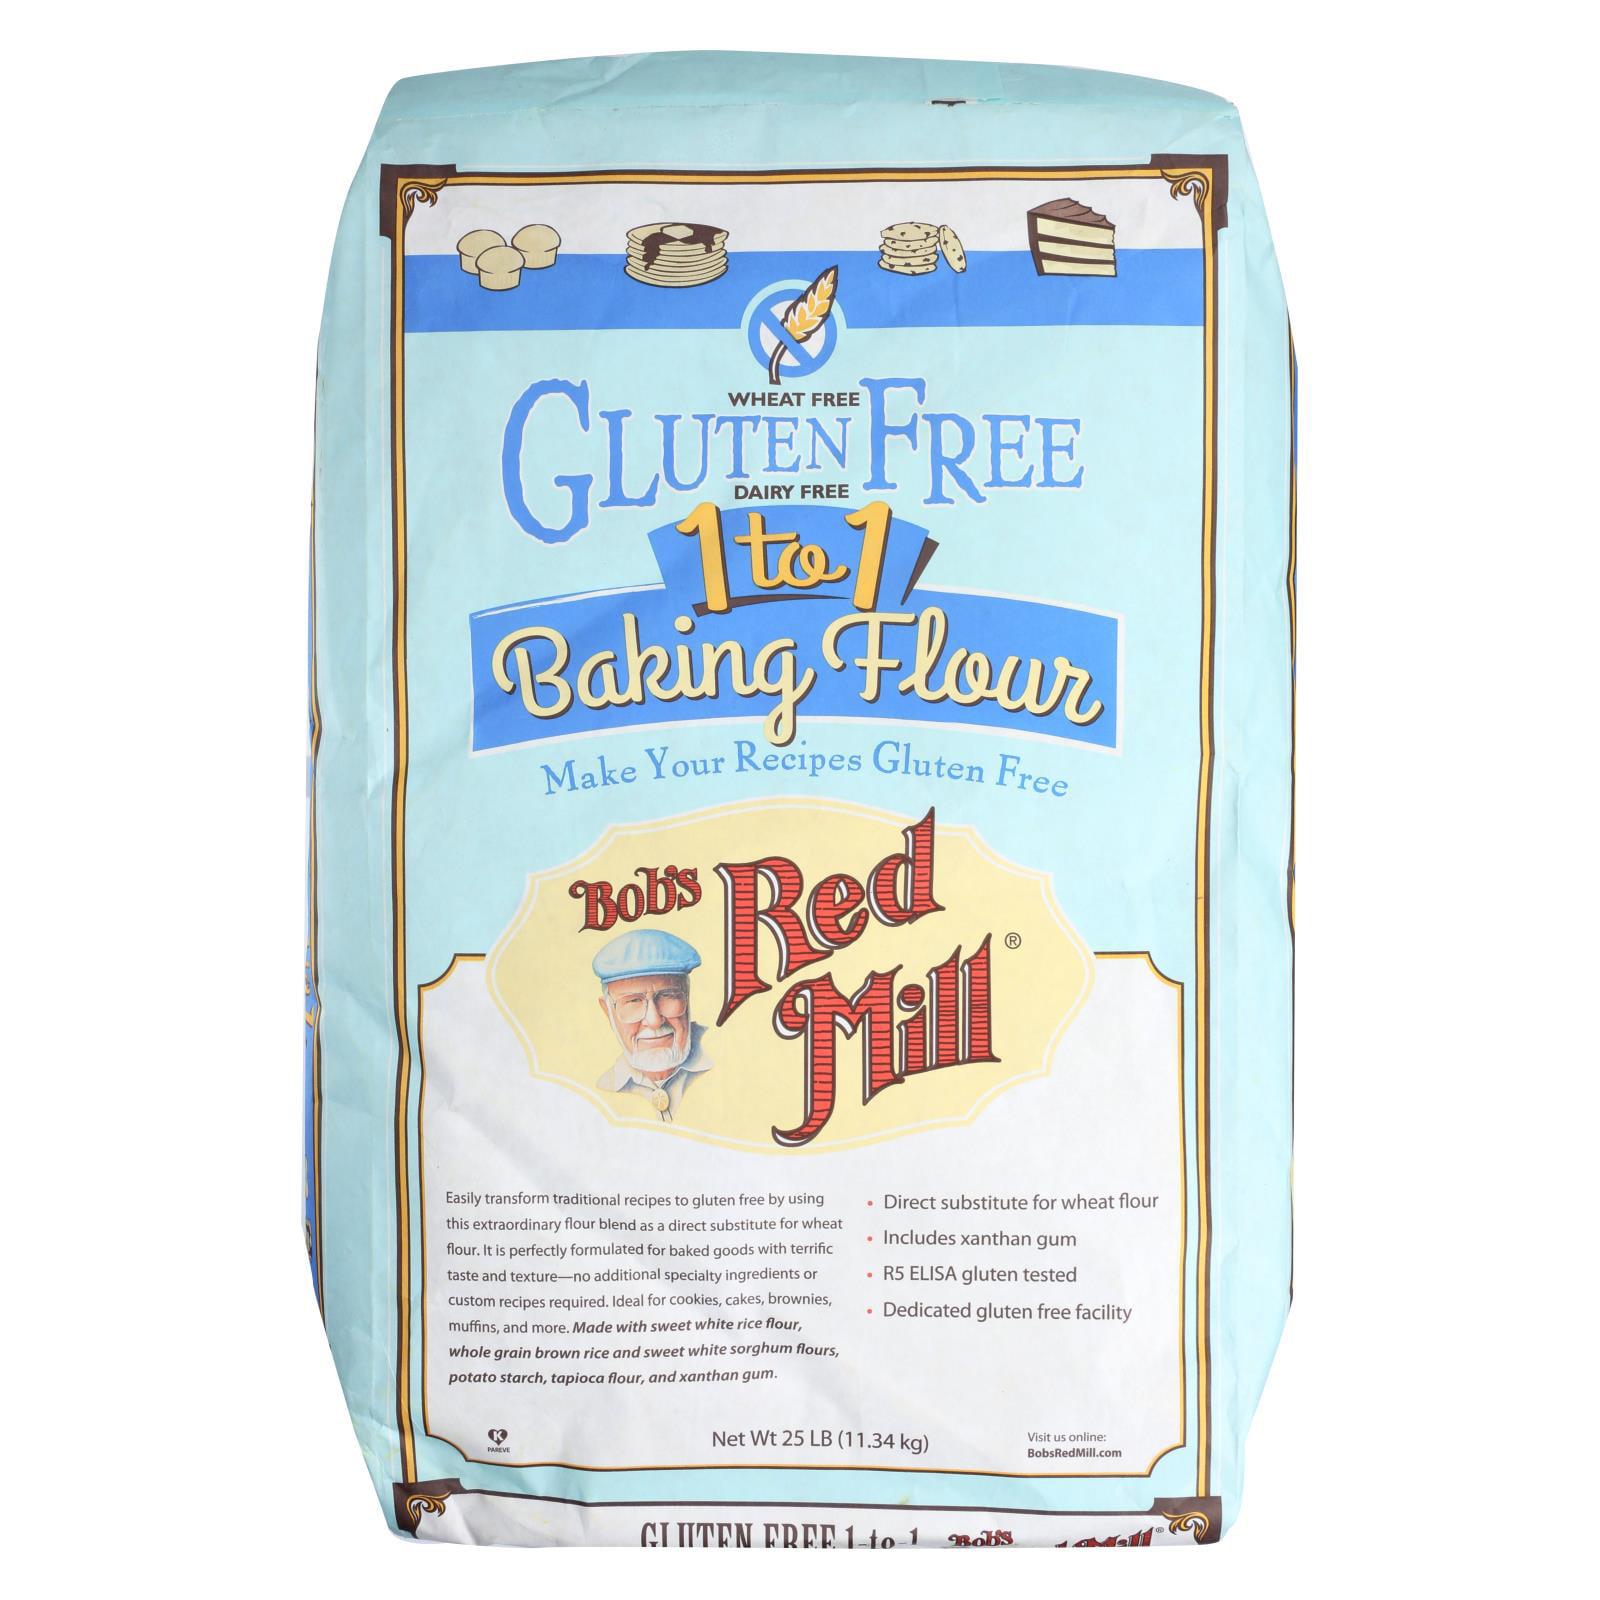 Bob's Red Mill - Gluten Free 1-to-1 Baking Flour - 25 lb